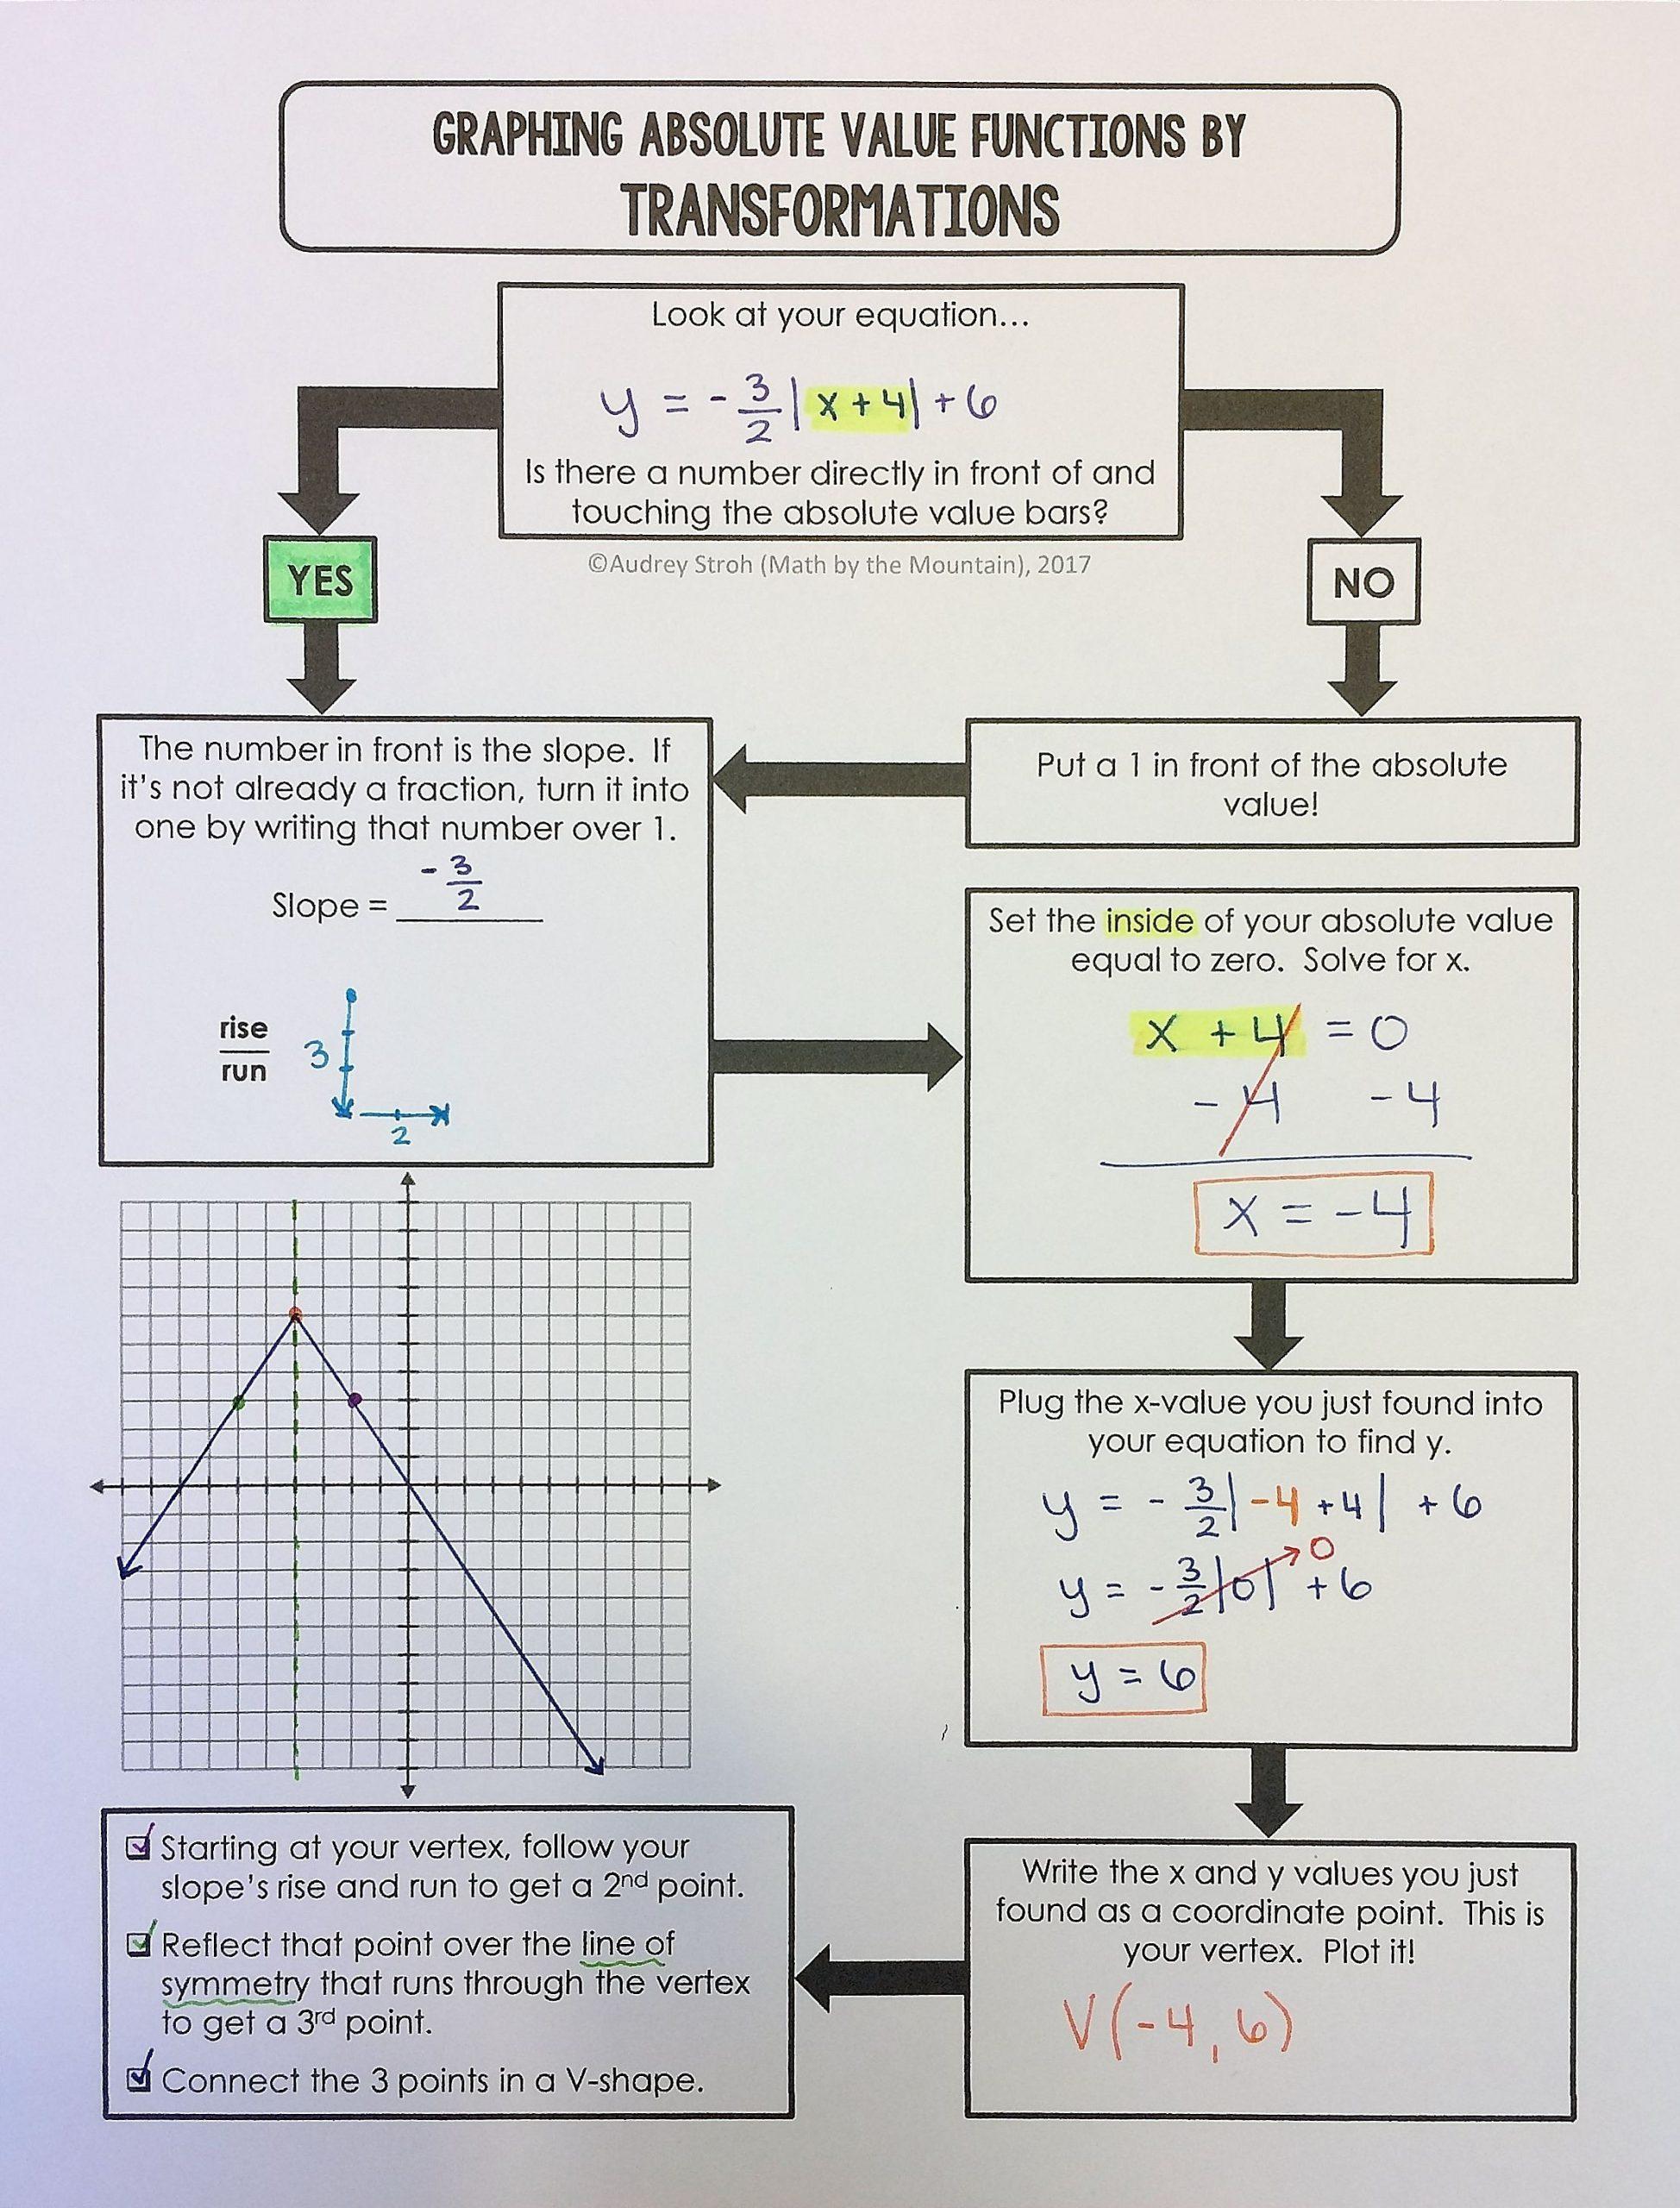 Graphing Absolute Value Inequalities Worksheet Graphing Absolute Value Functions Flowchart Graphic